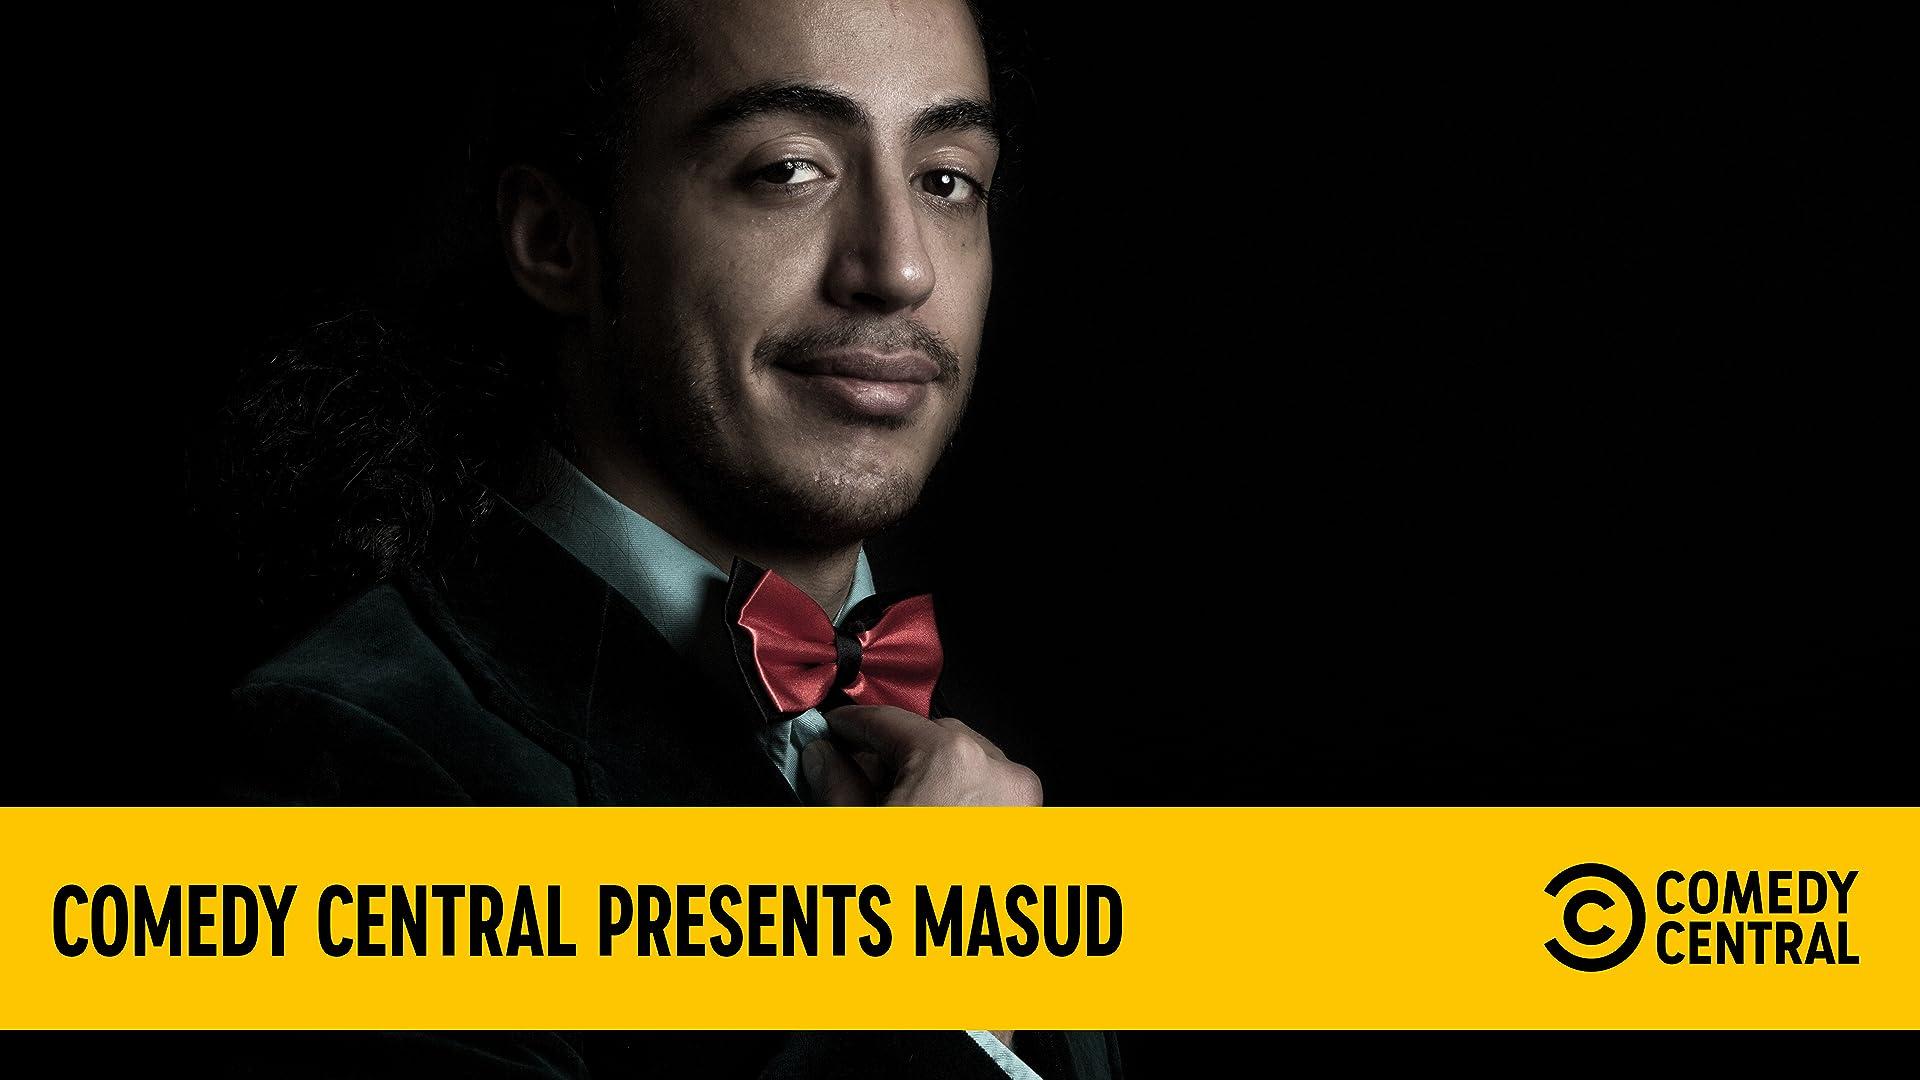 Comedy Central Presents Masud